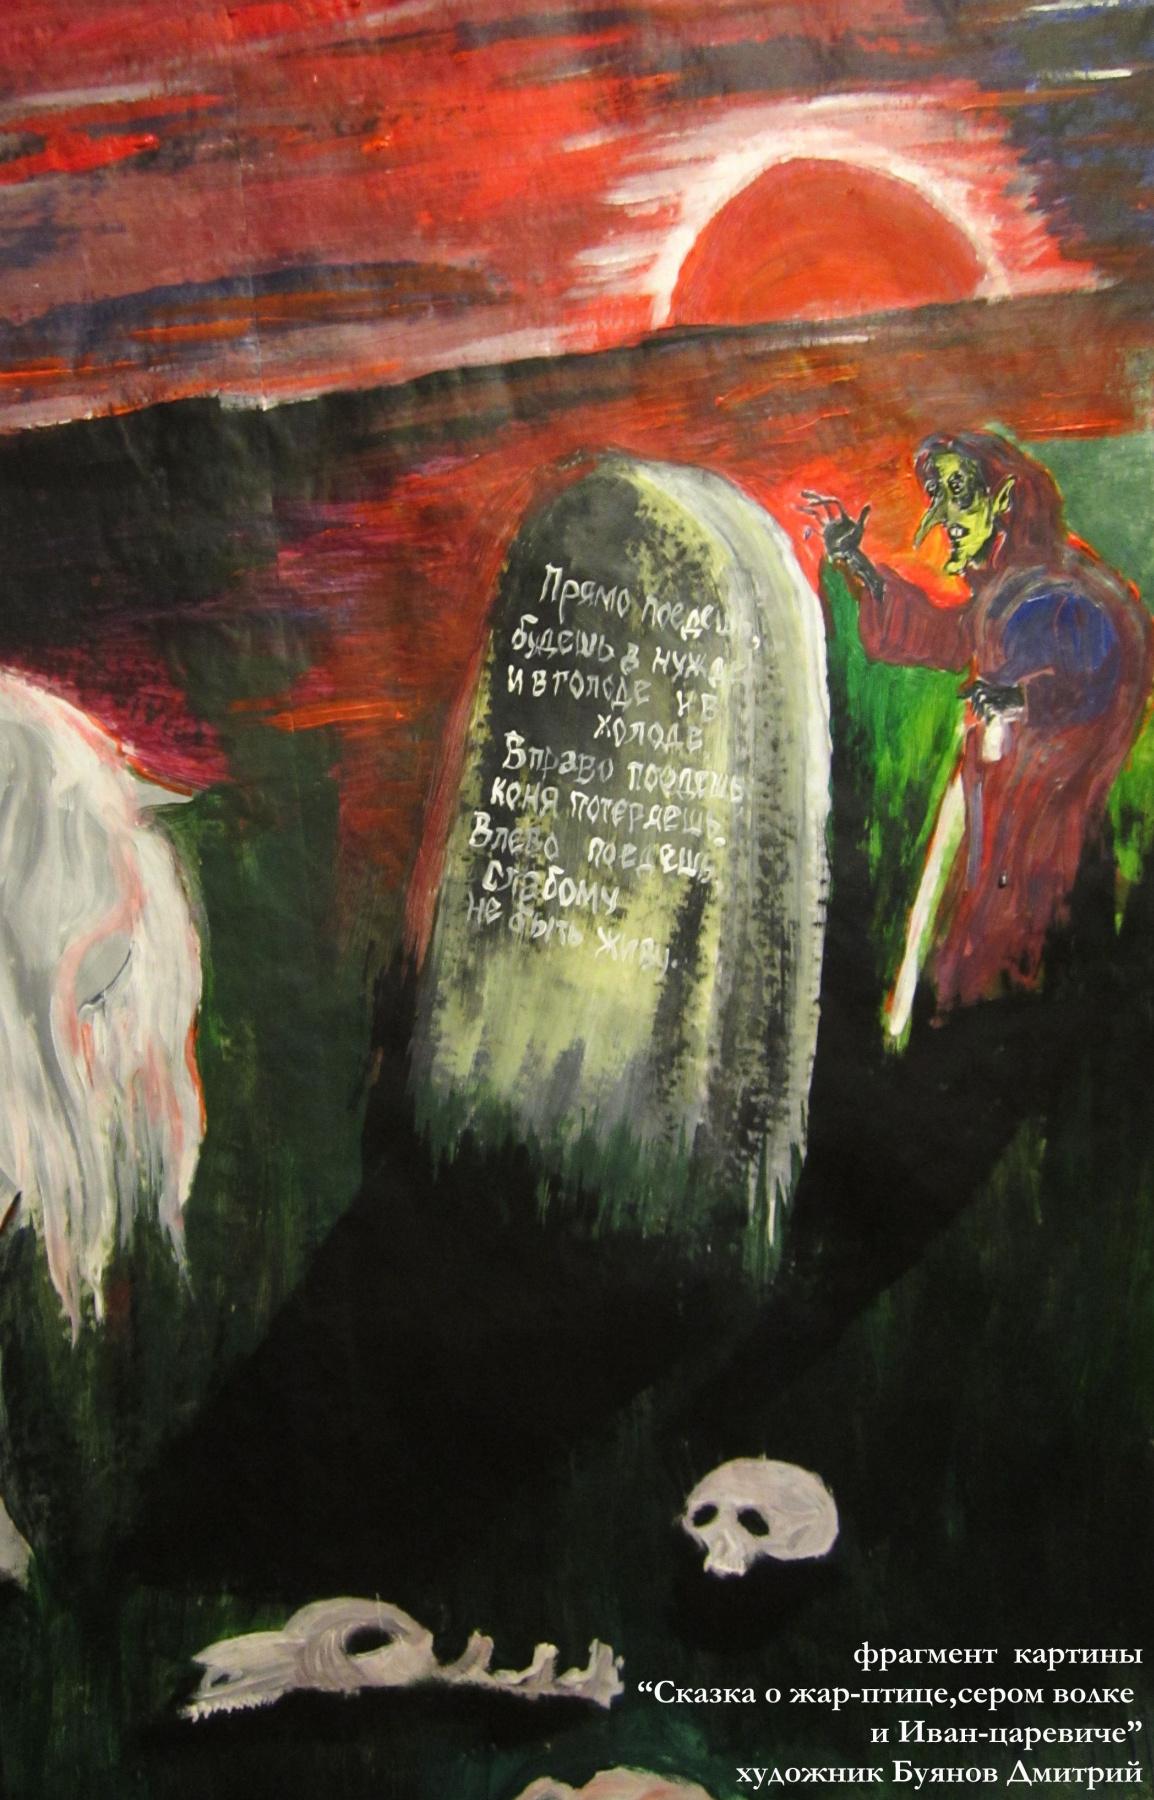 "Дмитрий Юрьевич Буянов. A fragment of the painting ""the Tale of the Firebird,and the grey wolf and Ivan Tsarevich,"" the artist Dmitry Buyanov"